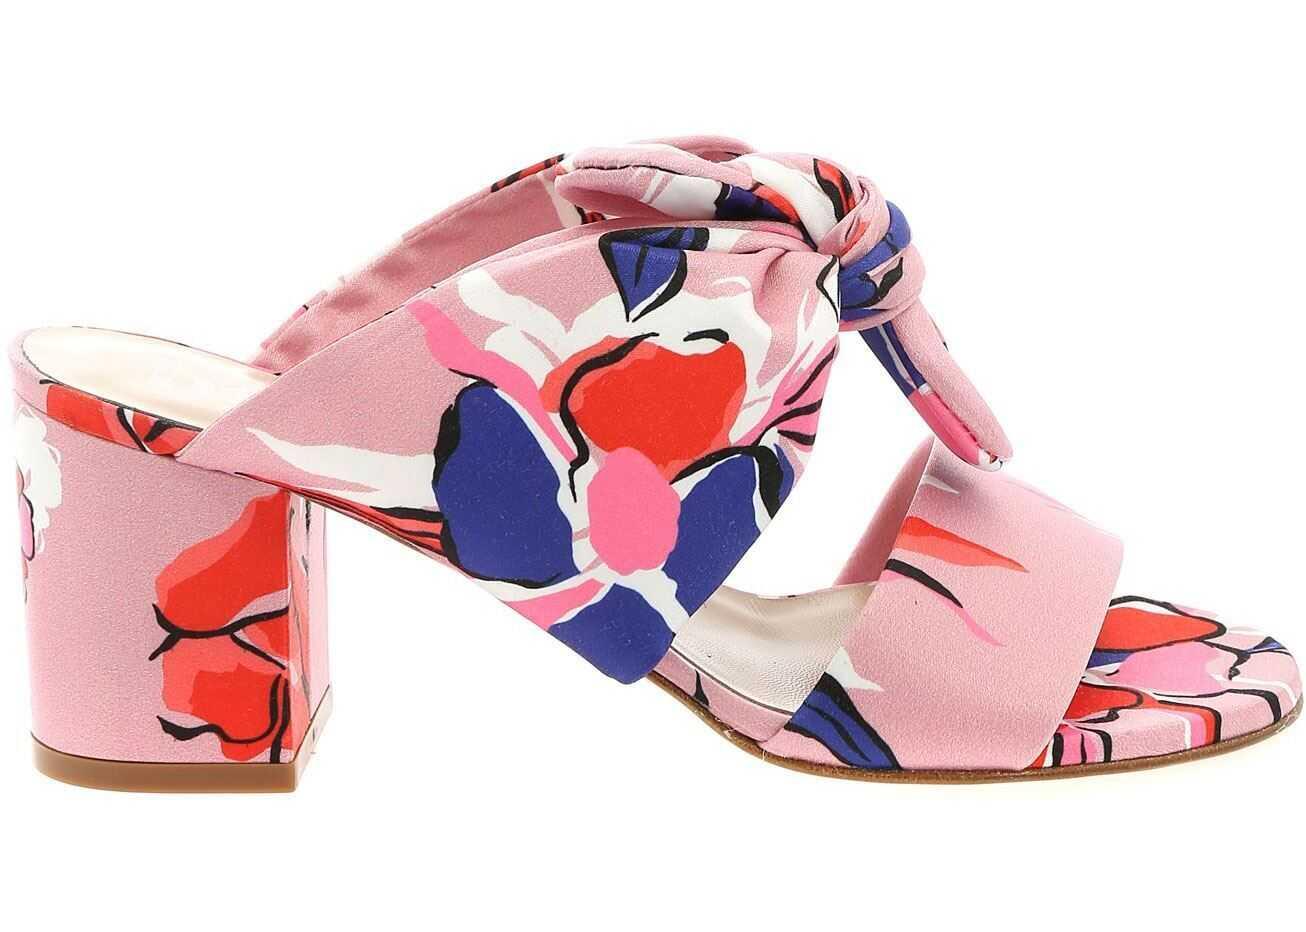 Be Blumarine Printed Satin Sandals In Pink Pink